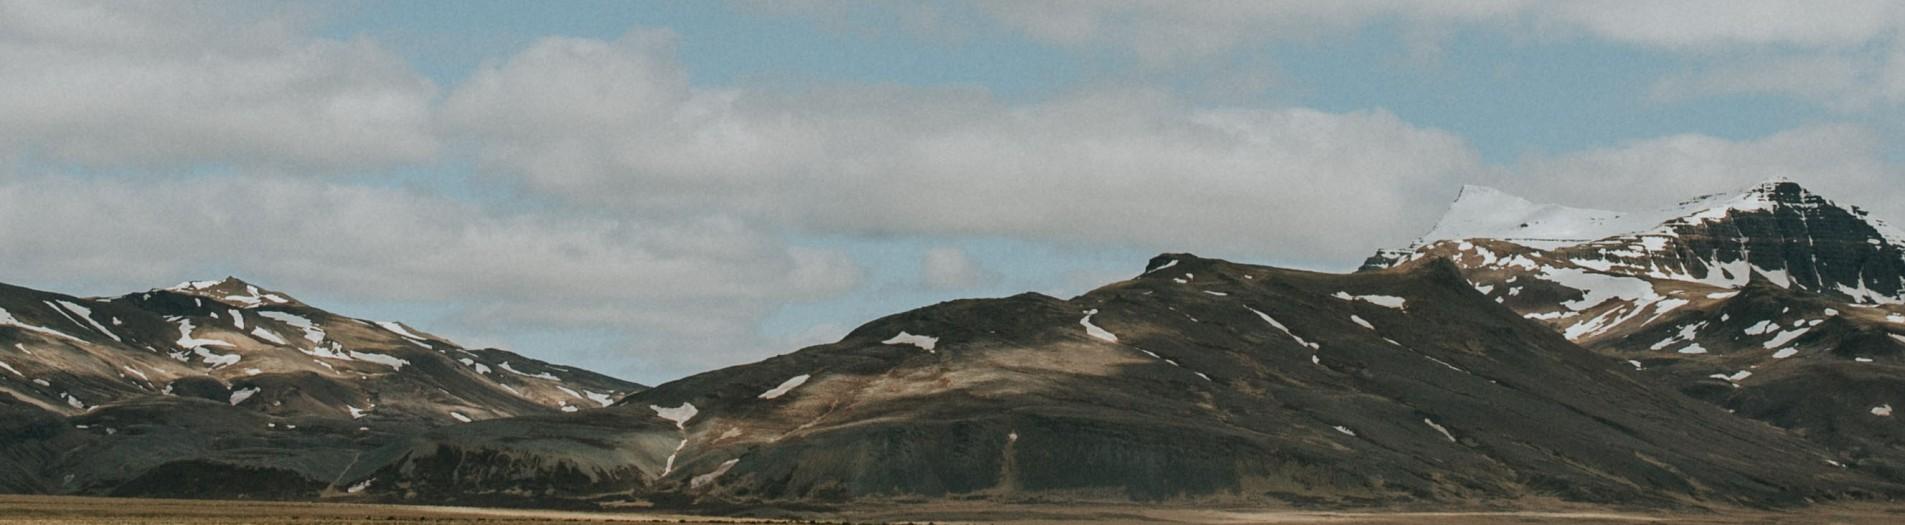 Iceland | Reykjavik - Hotel Budir - Olafsvik